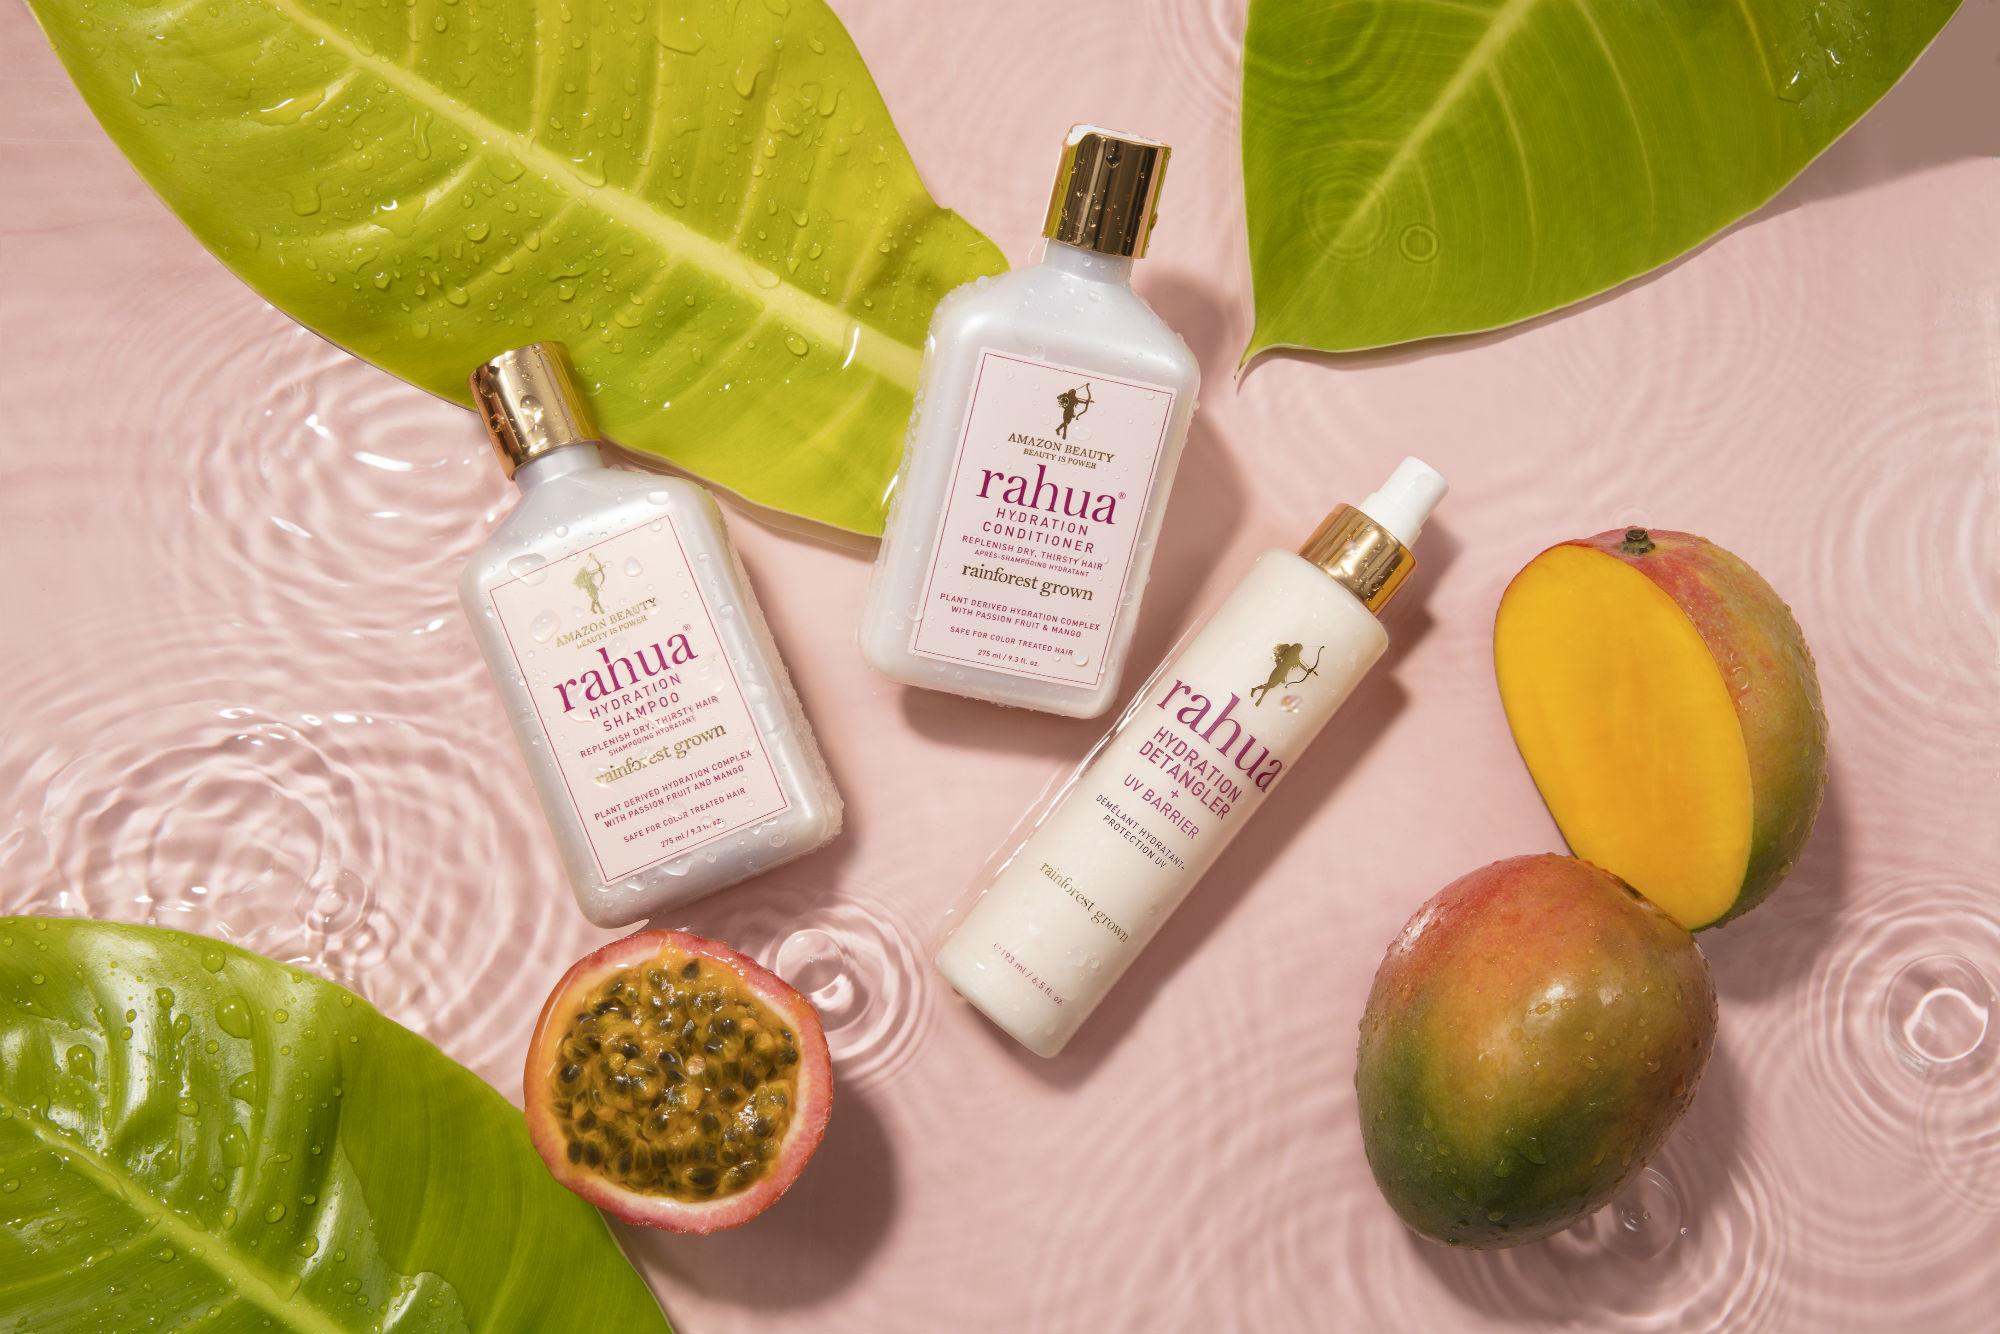 Hair care range Rahua is completely vegan